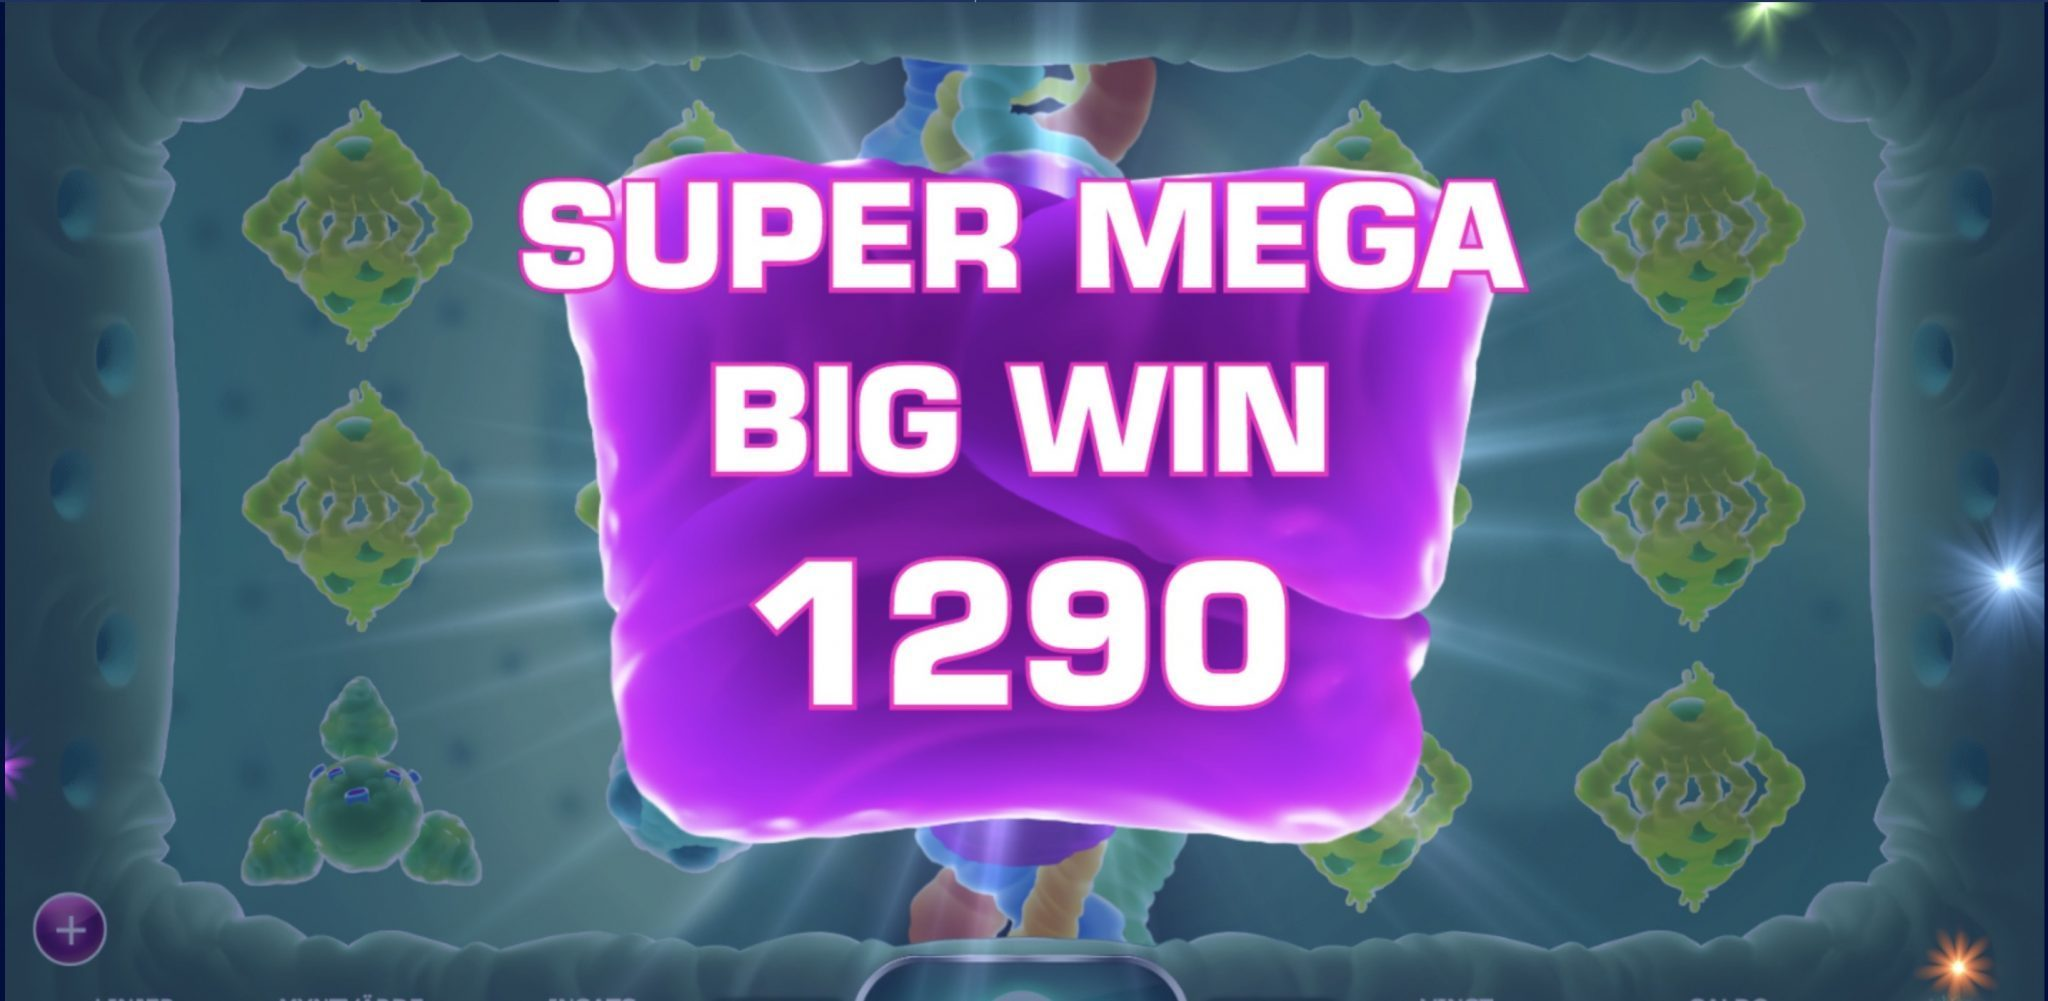 cyrus-the-virus-super-mega-win